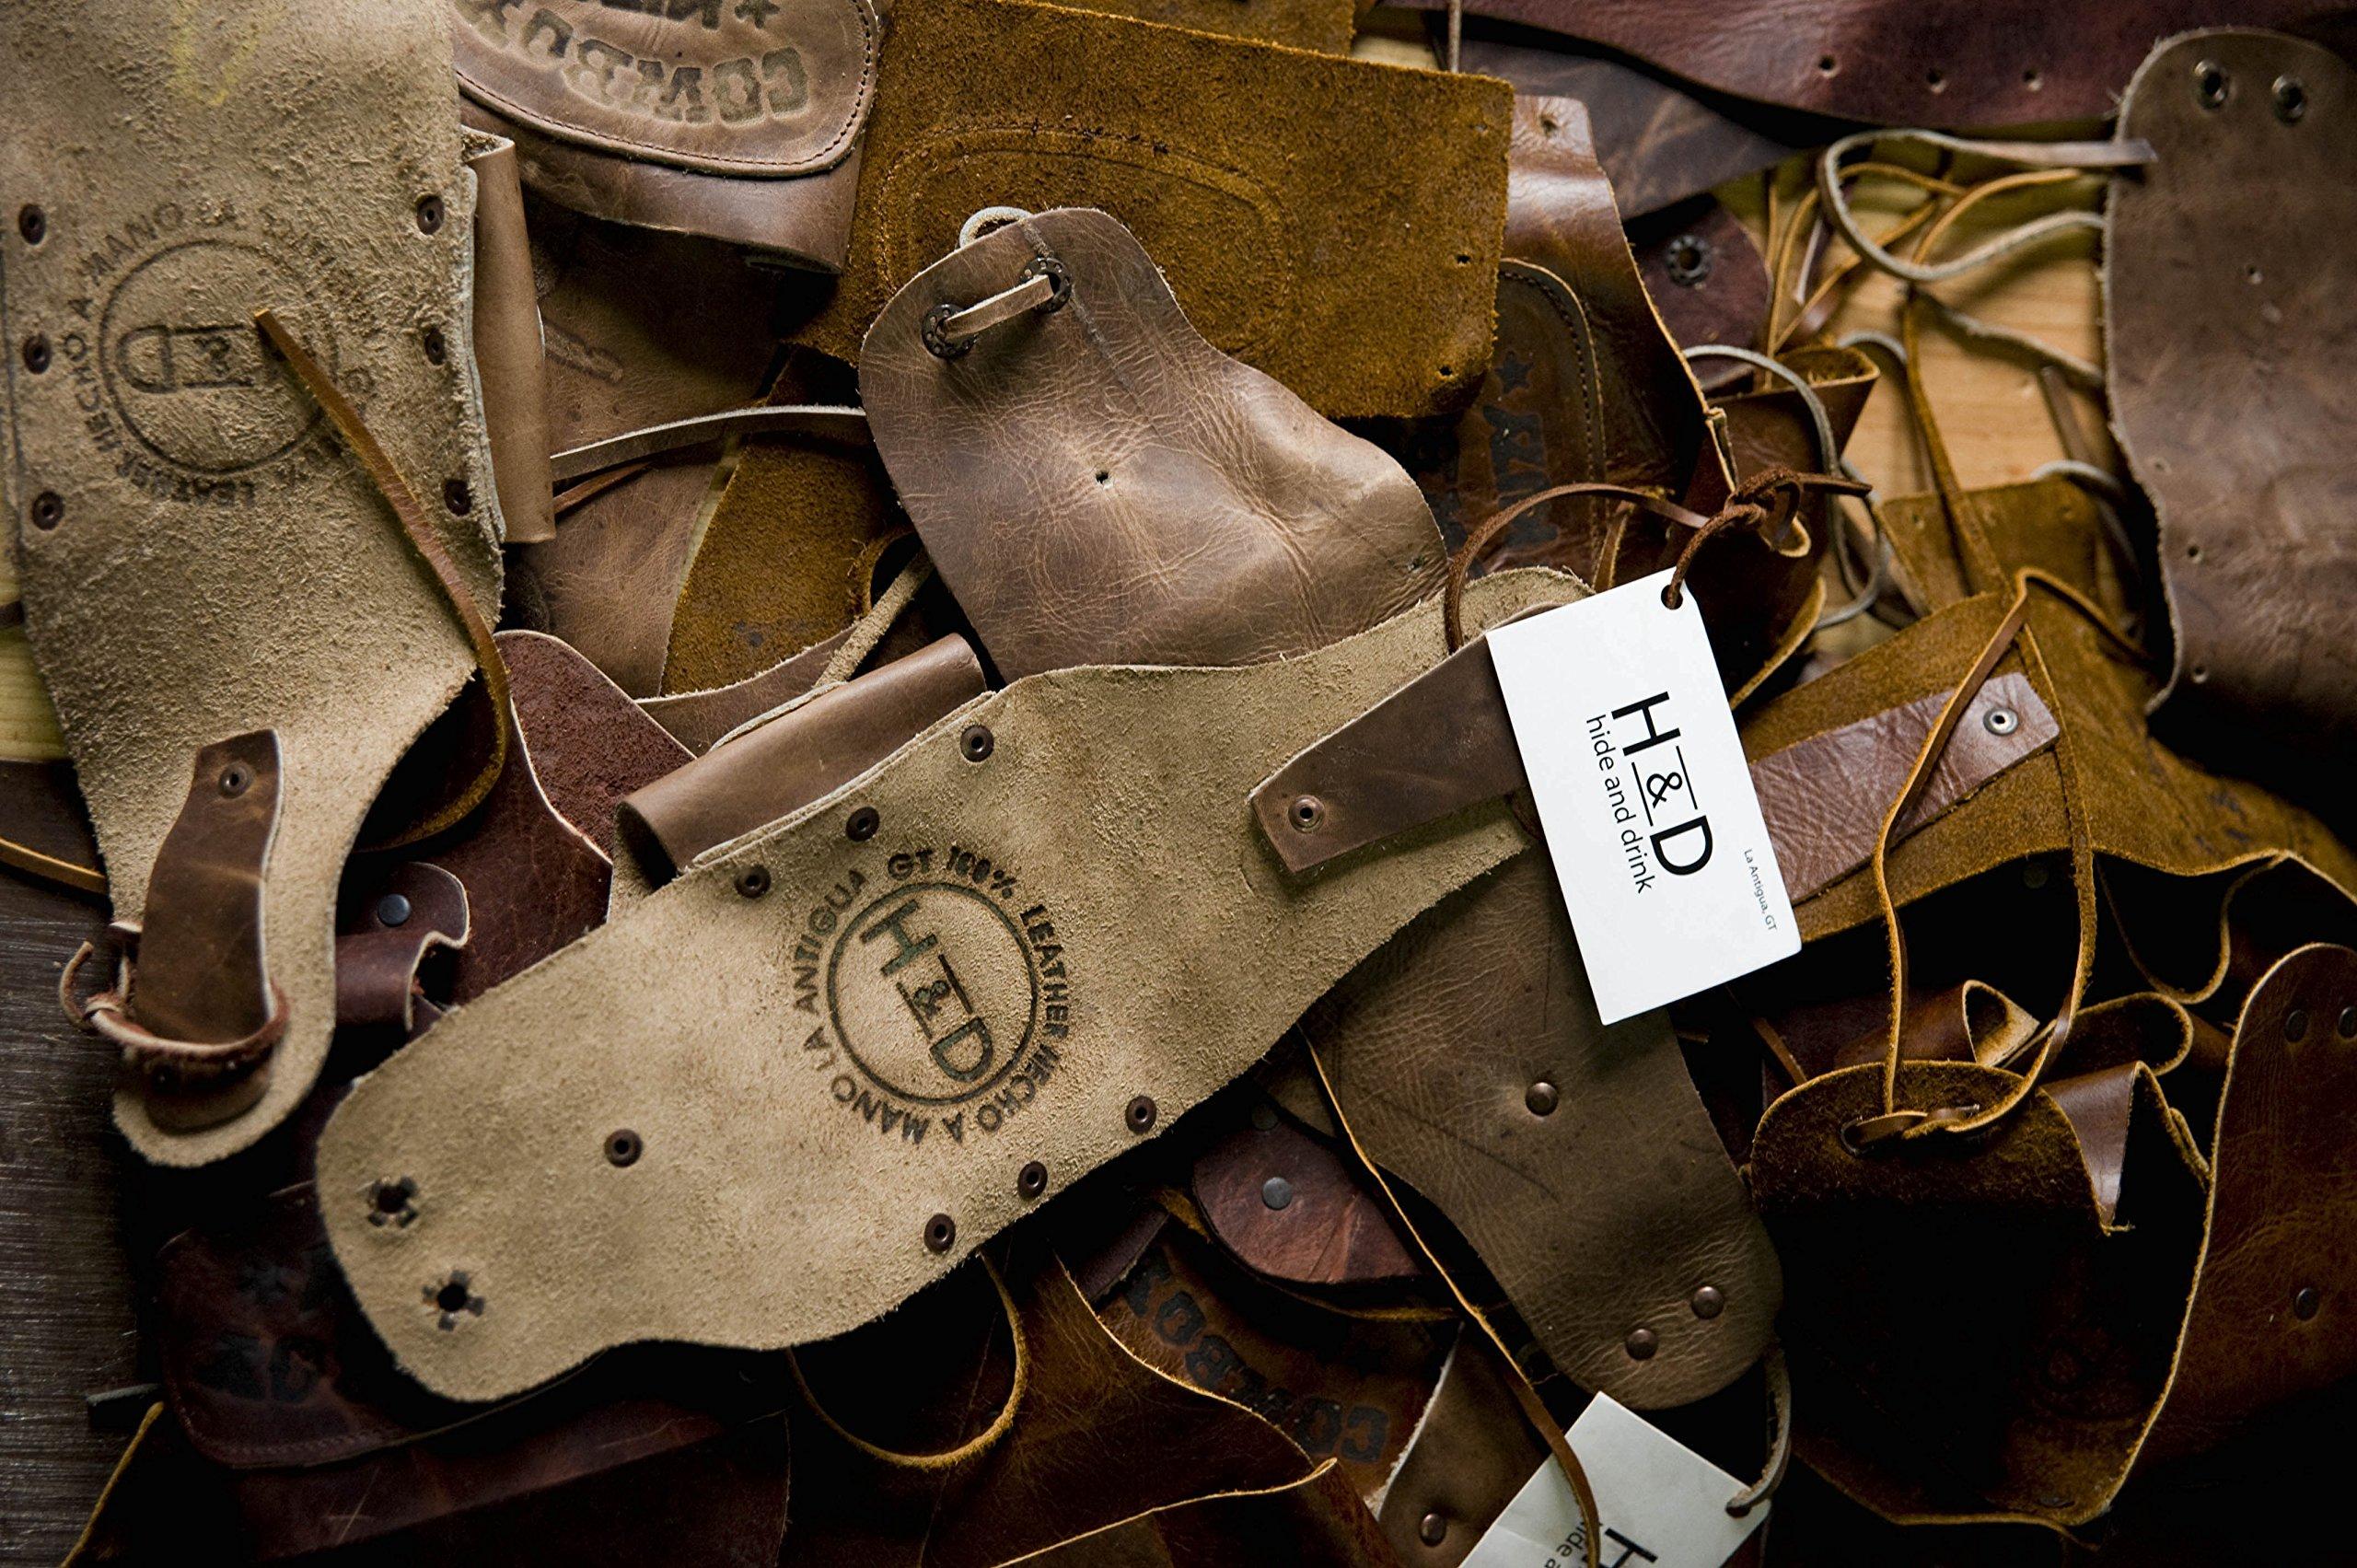 Leather Key Chain & Headphone Wrap Handmade by Hide & Drink :: Black